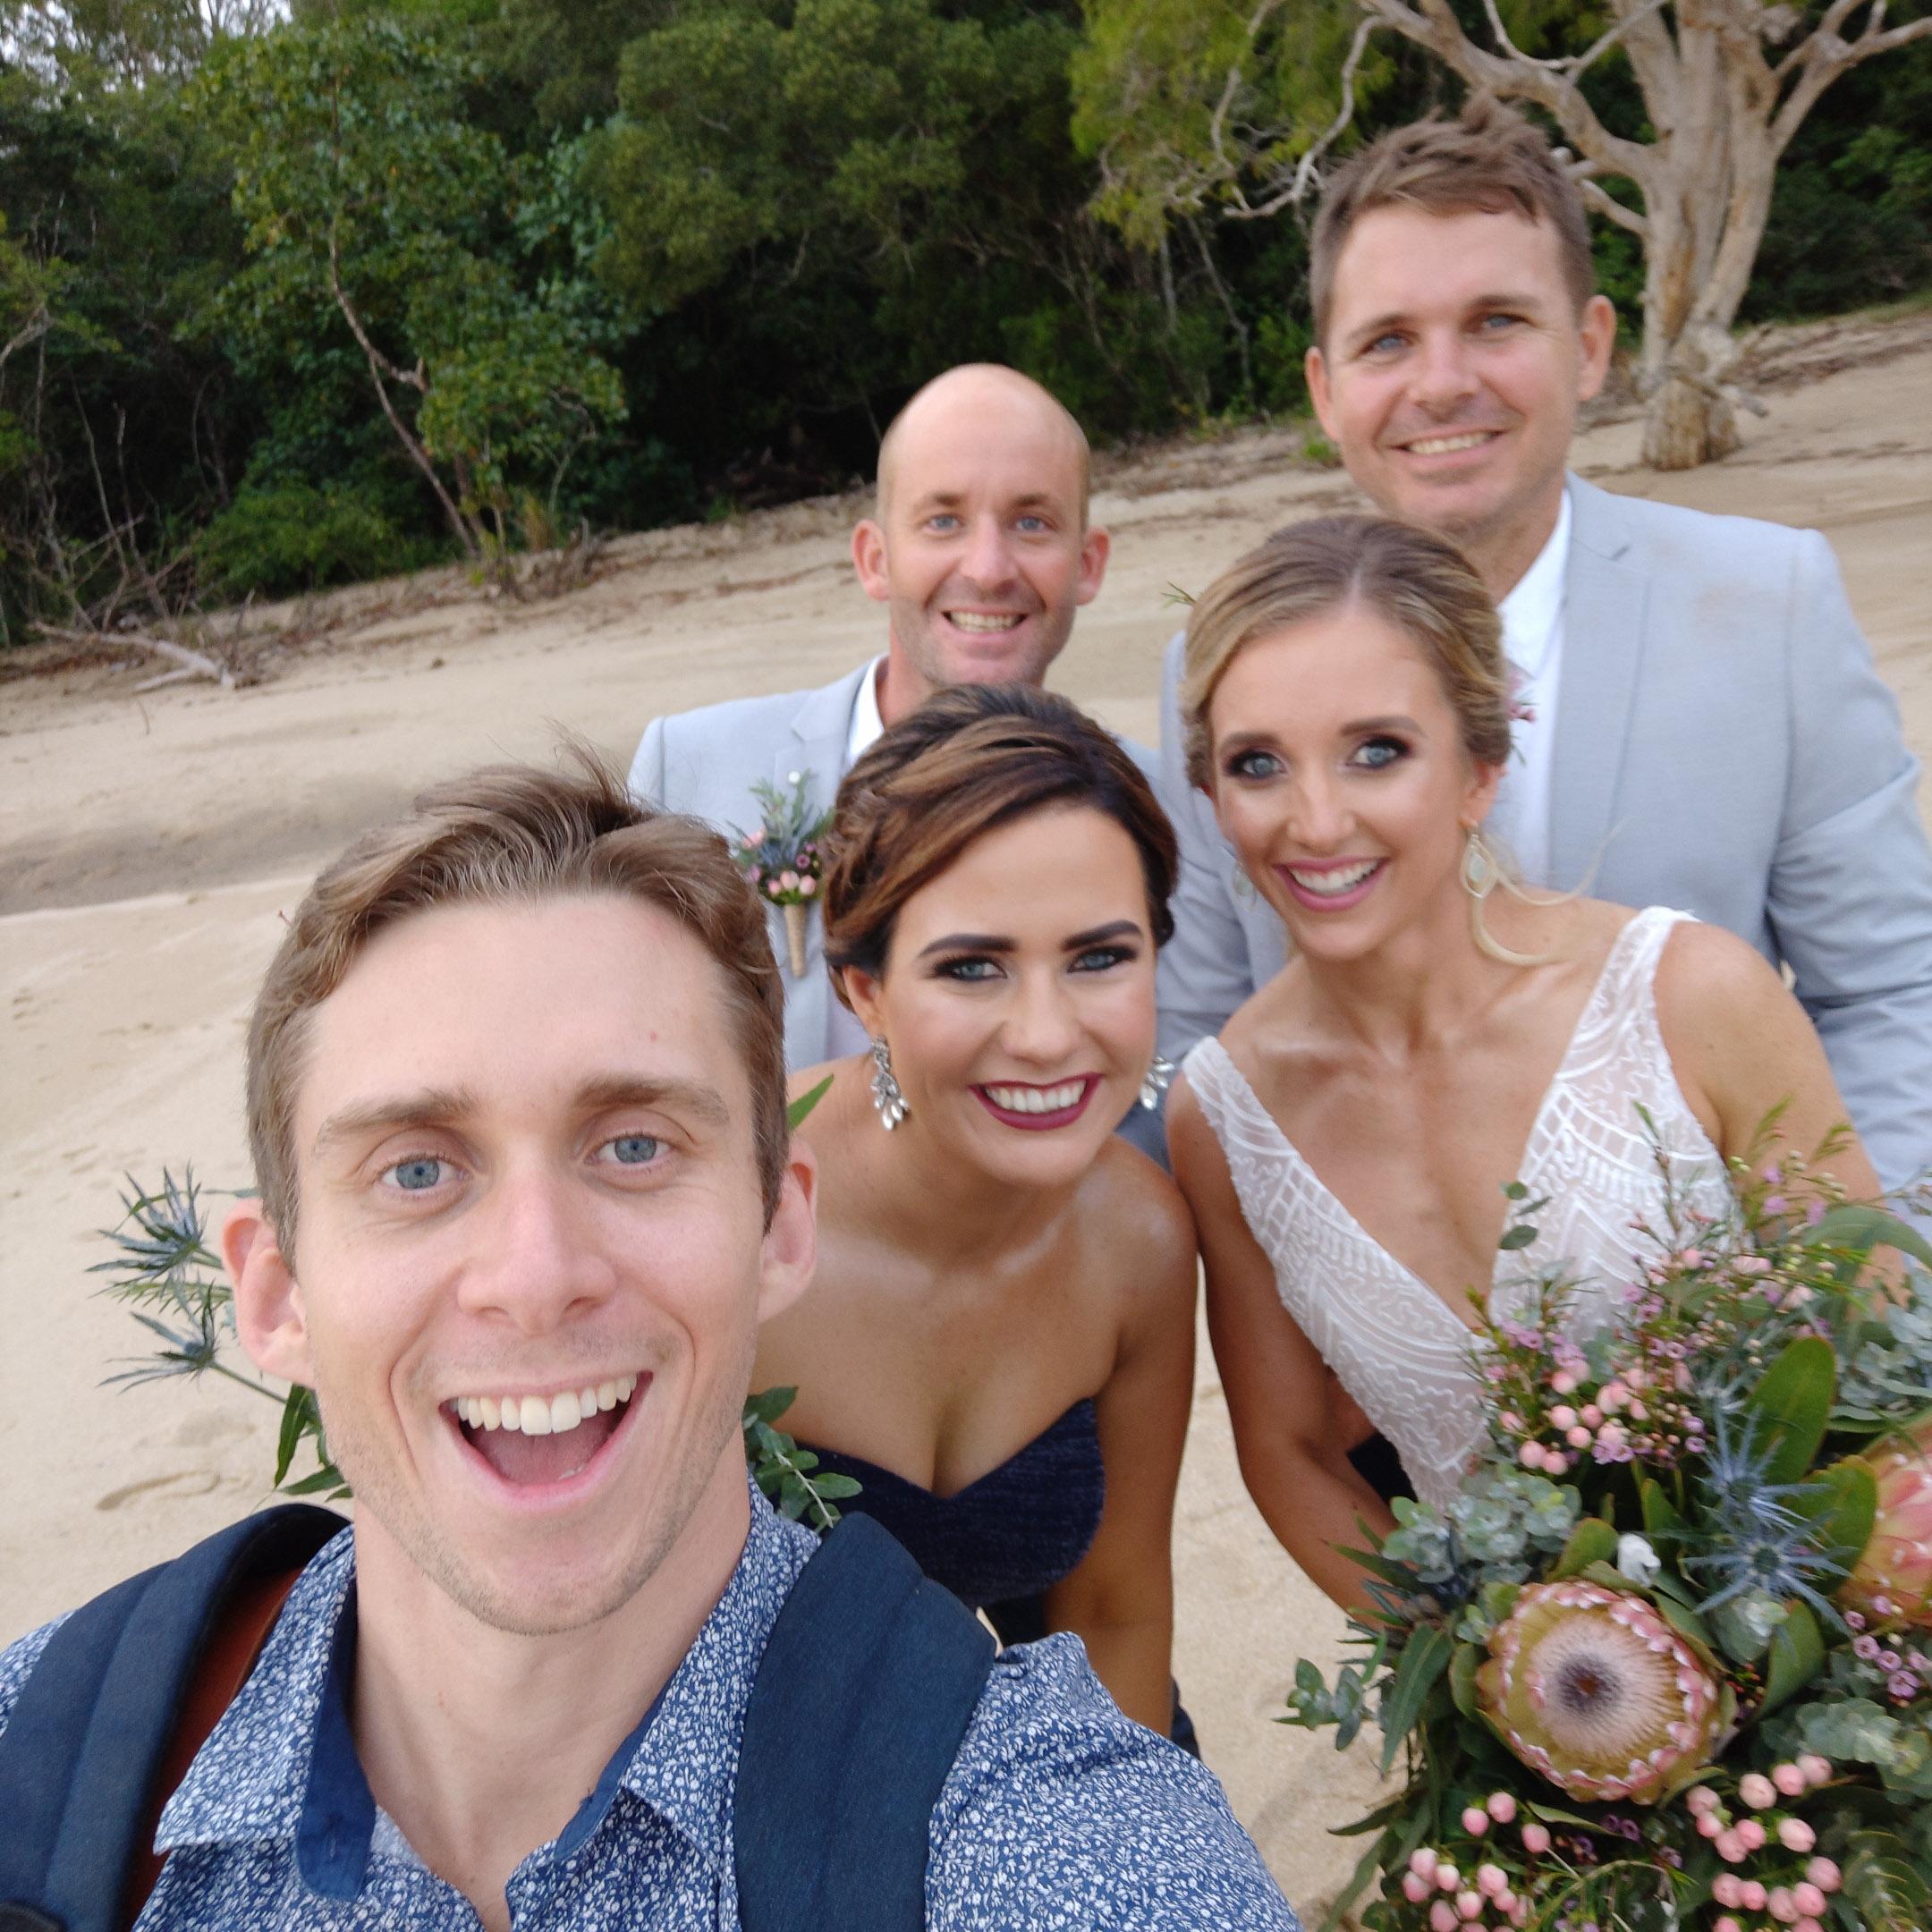 The-raw-photographer-cairns-wedding-photography-bridalparty-selfie-6.jpg